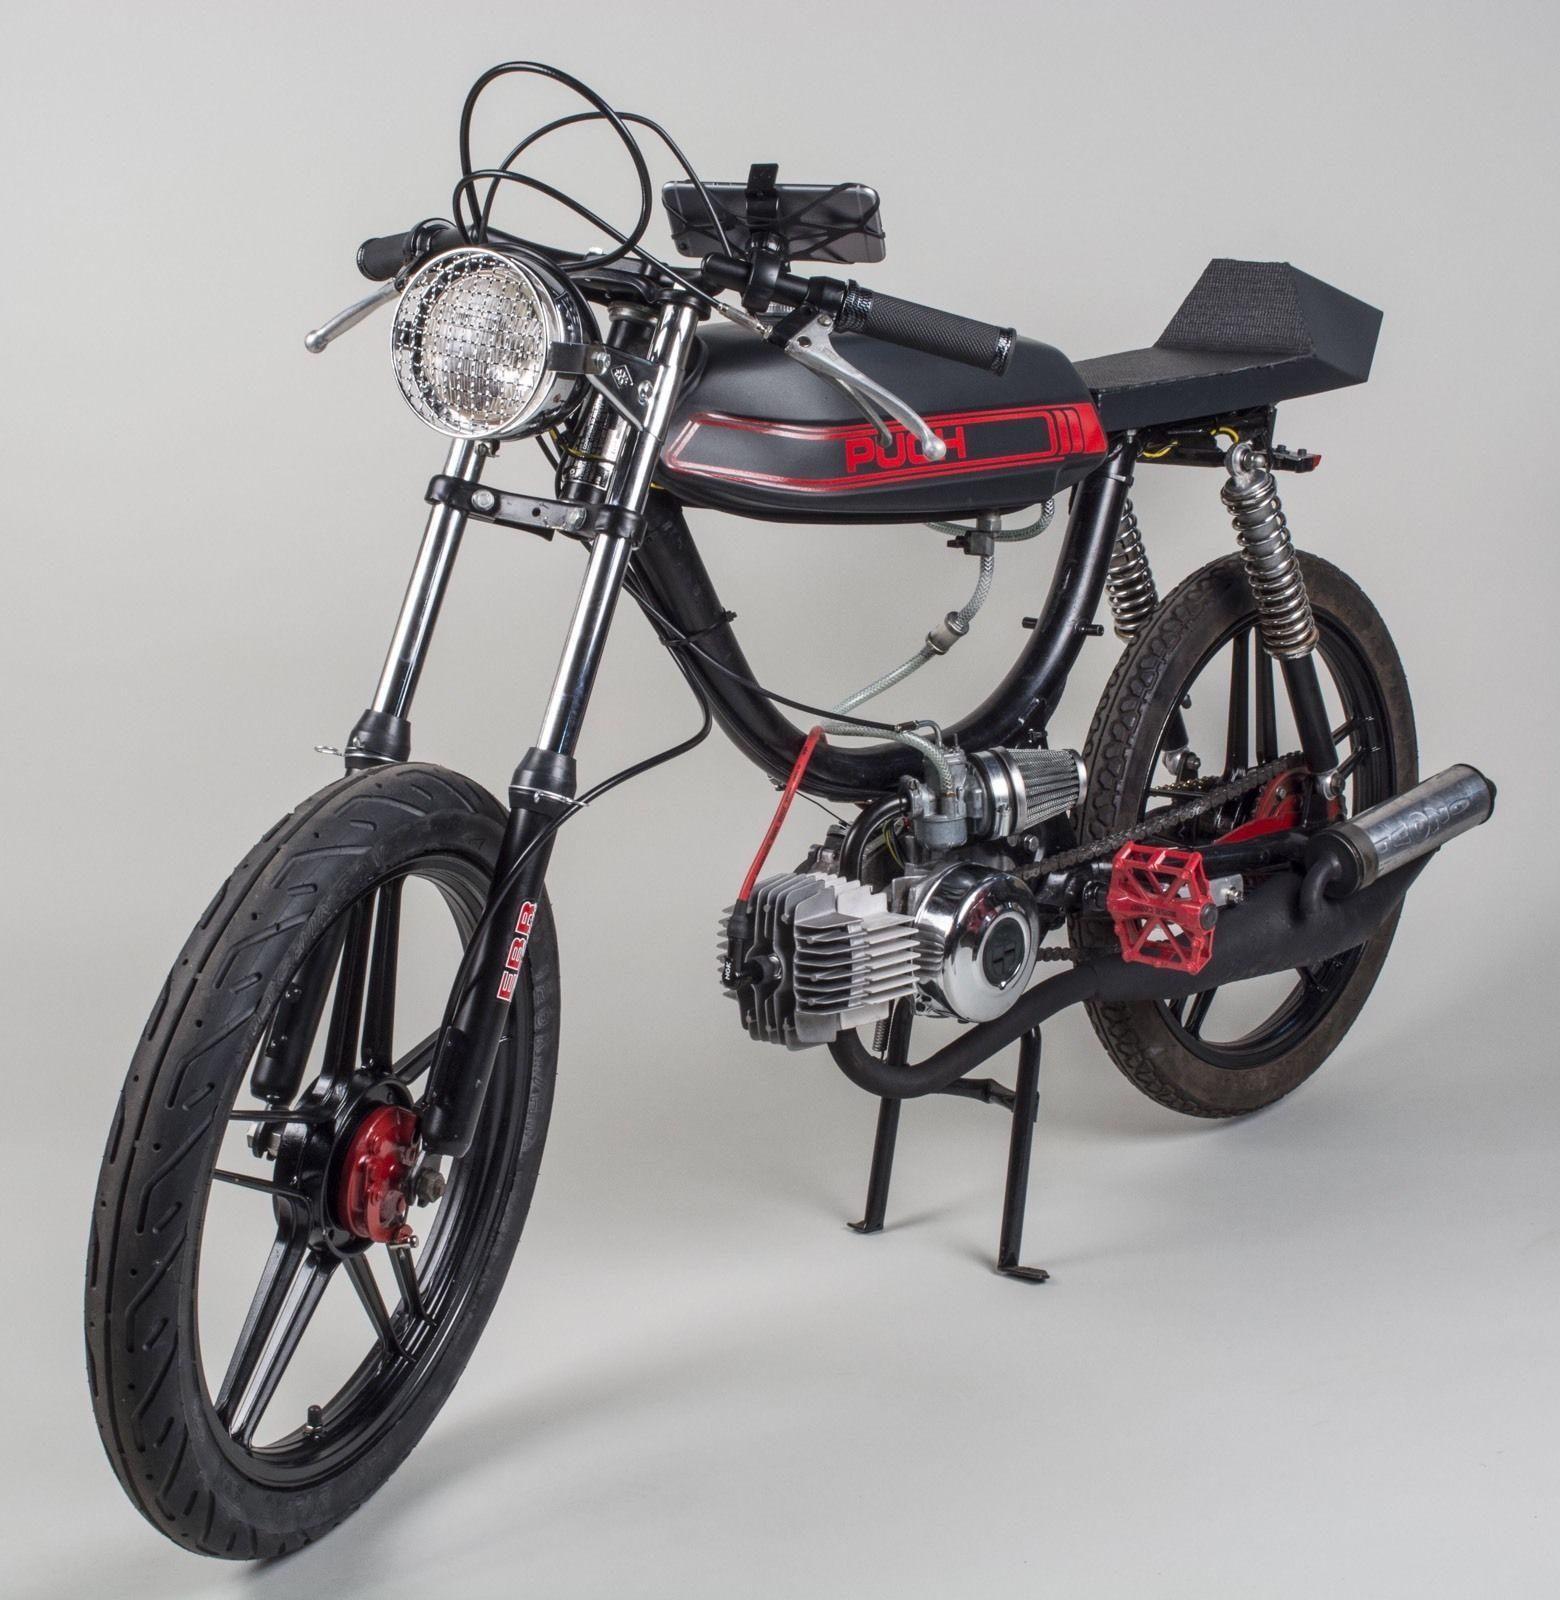 puch magnum moped flat black 51mph 70cc ebay cars. Black Bedroom Furniture Sets. Home Design Ideas